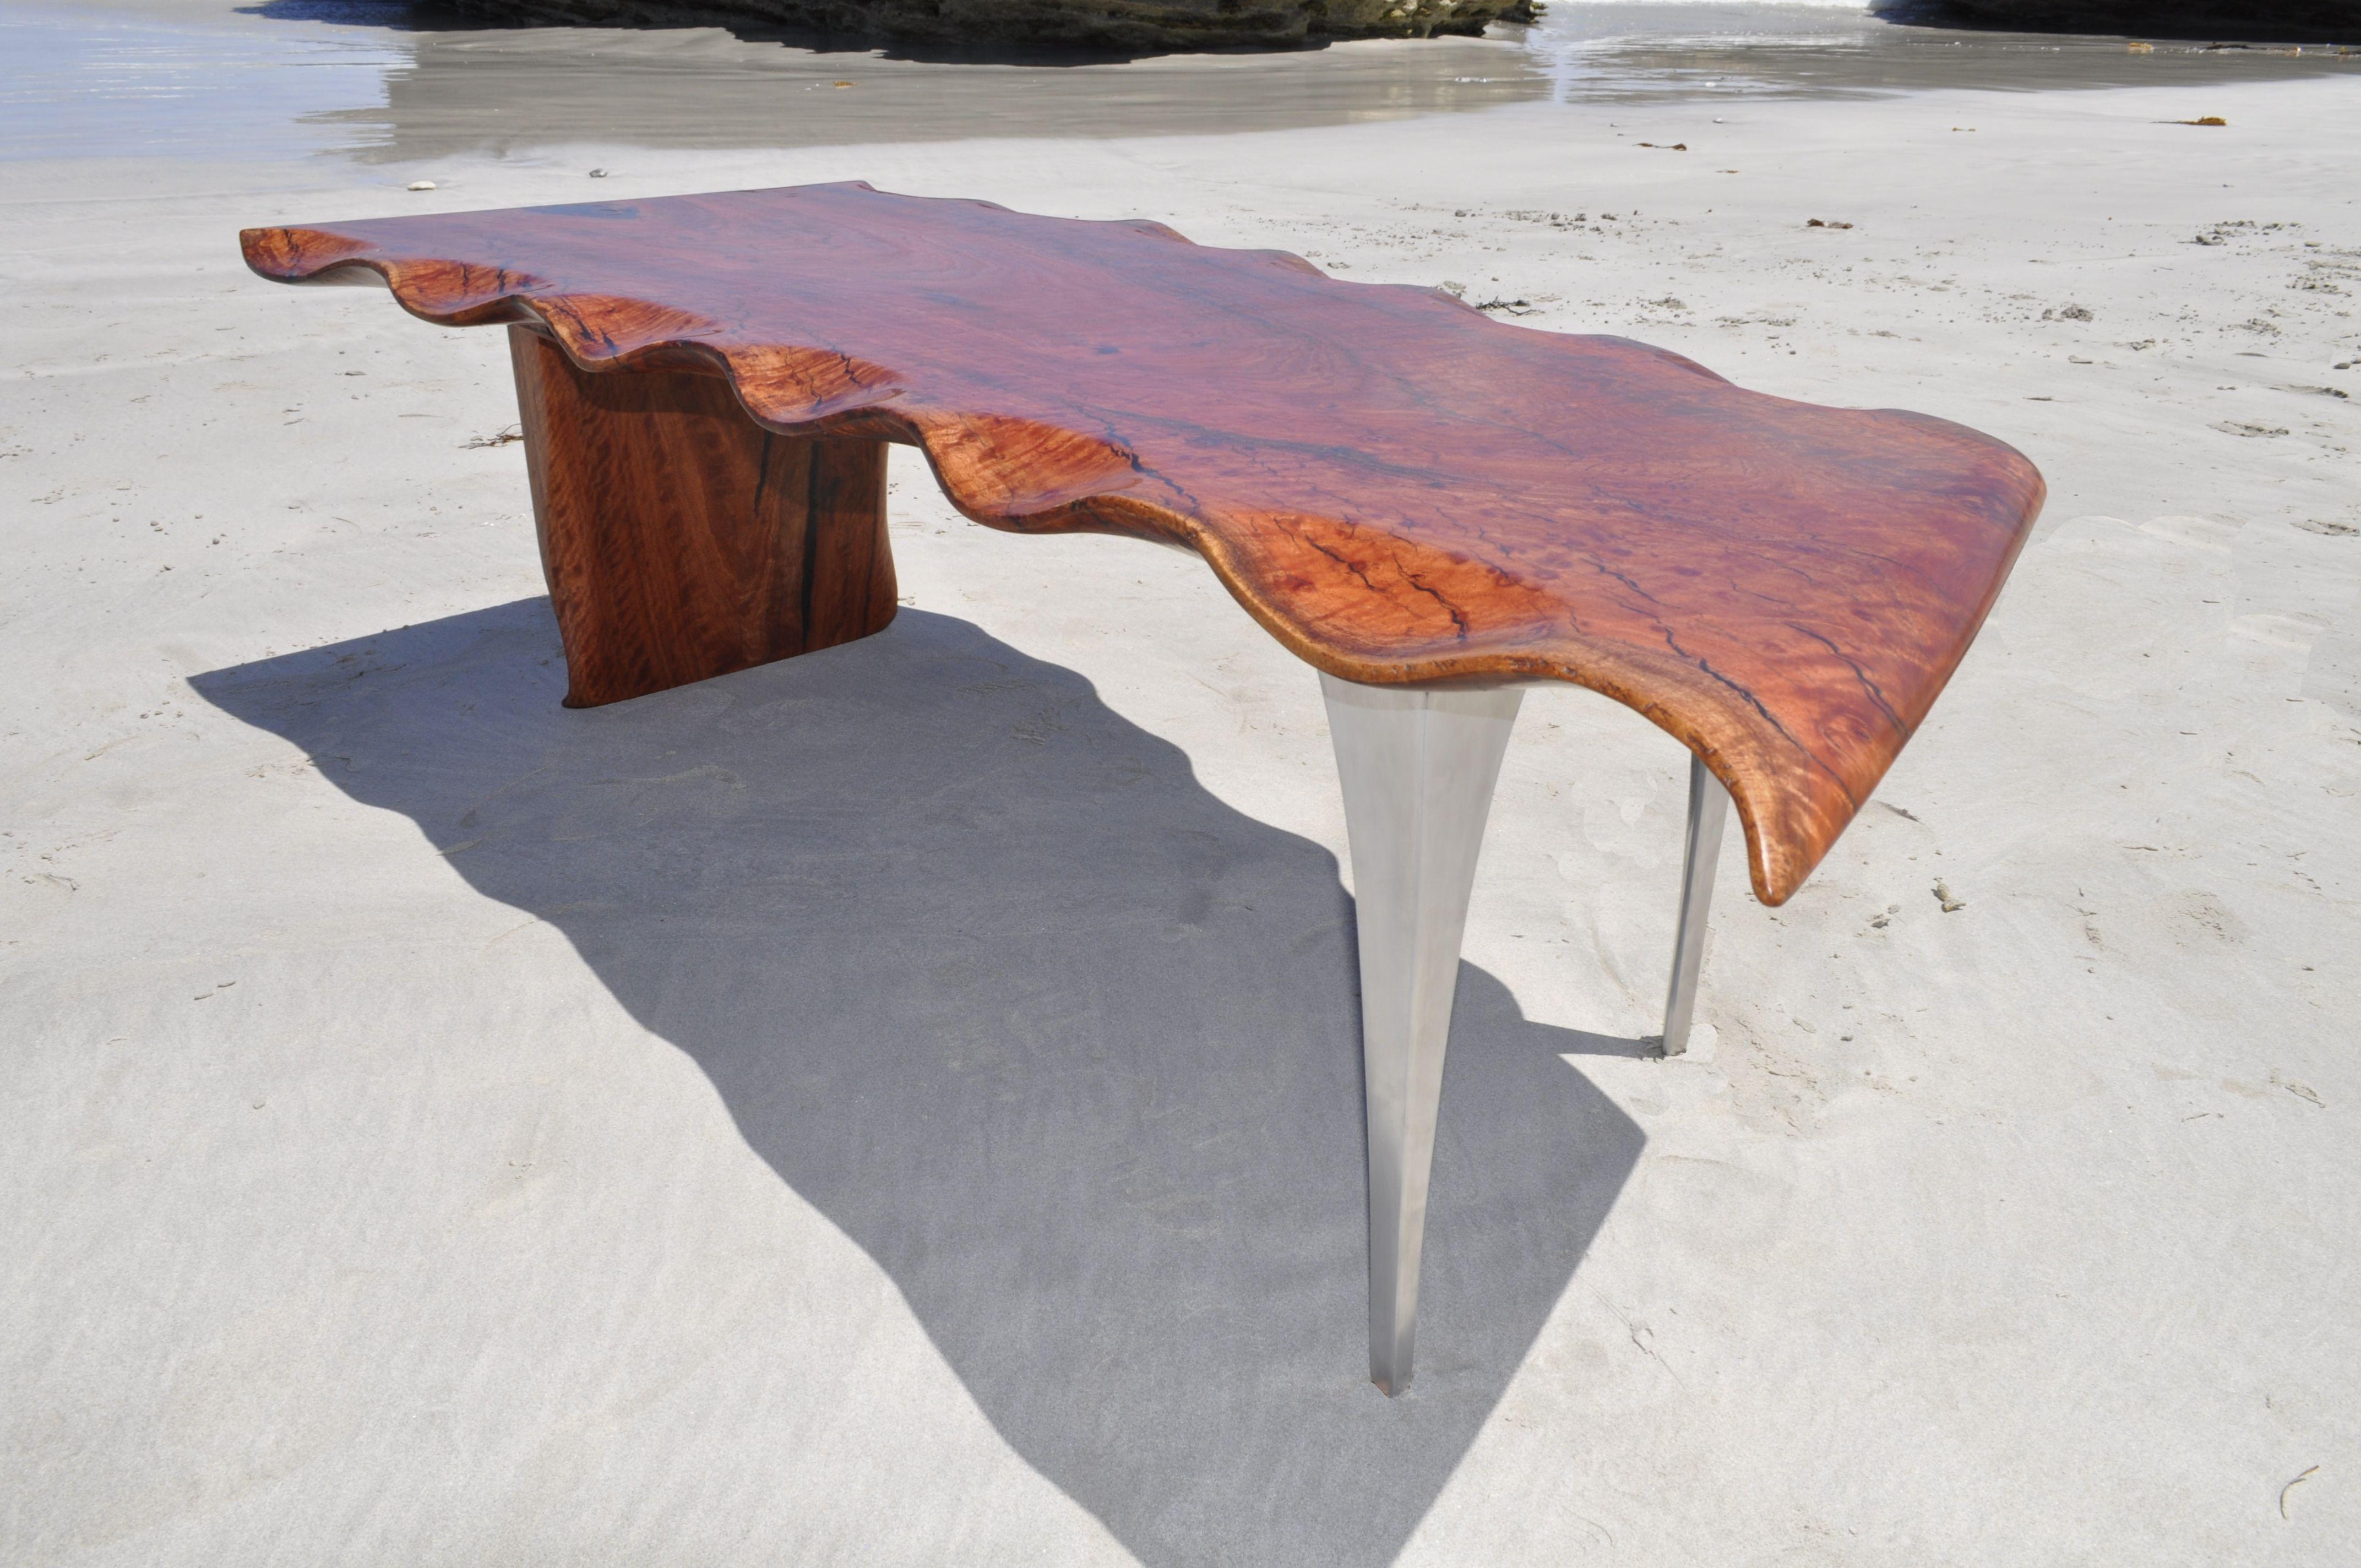 Ocean View Series Redgum Single slab of Redgum with waves